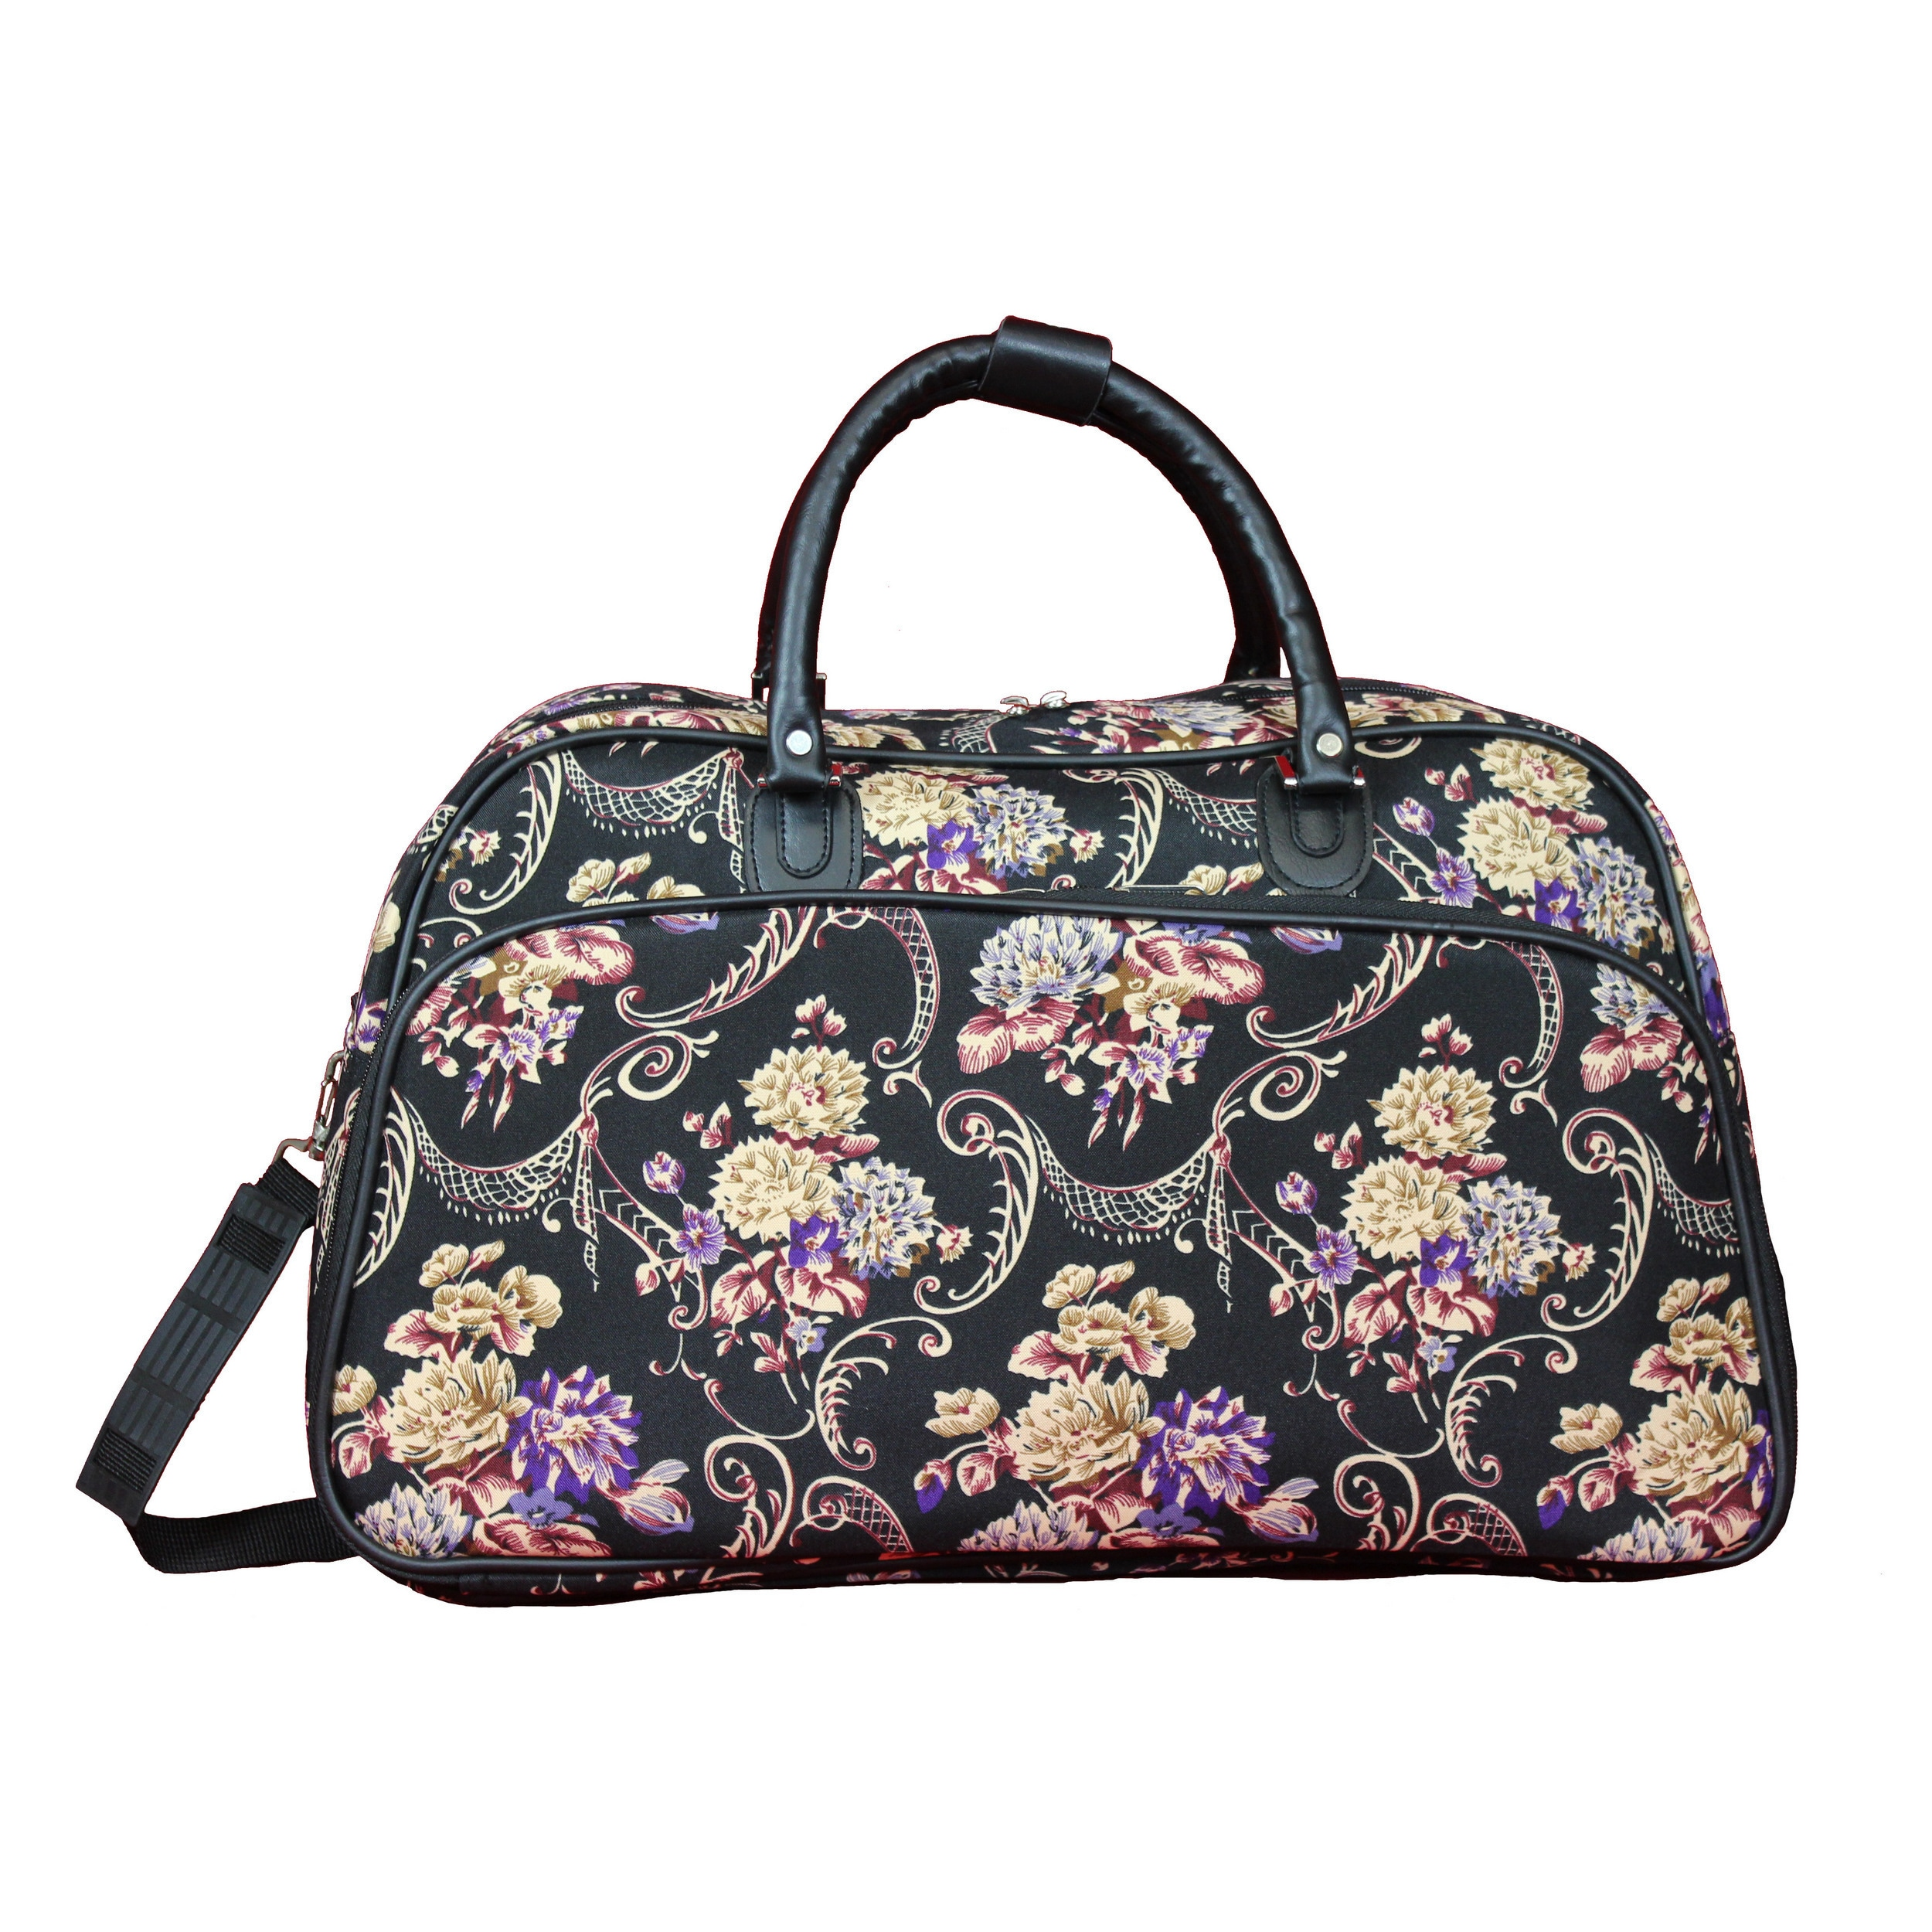 c407b212e255 World Traveler Duffel Bags